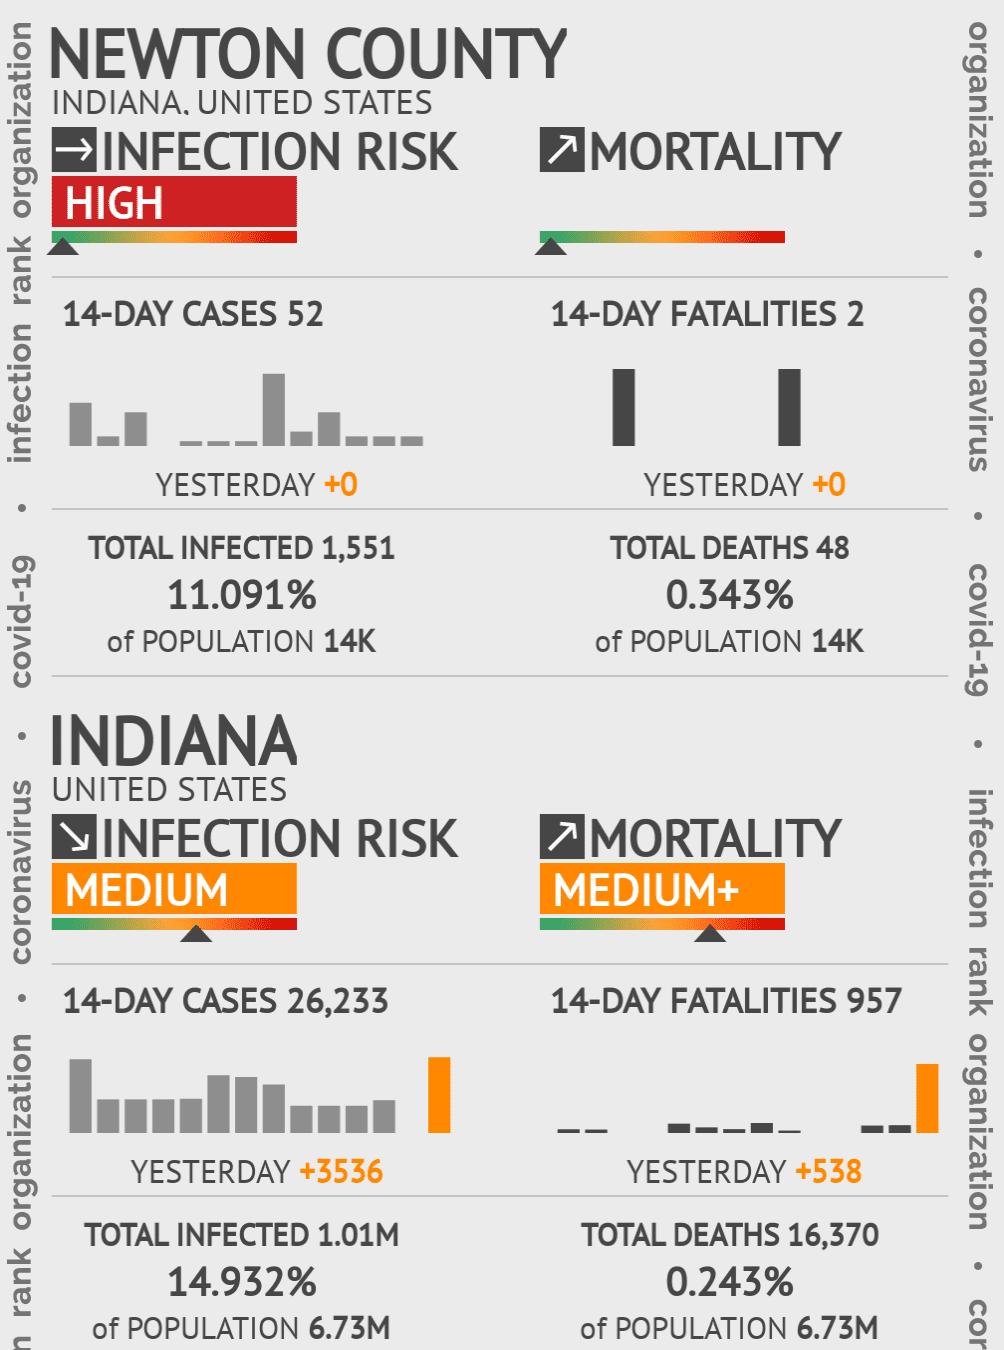 Newton County Coronavirus Covid-19 Risk of Infection on November 26, 2020